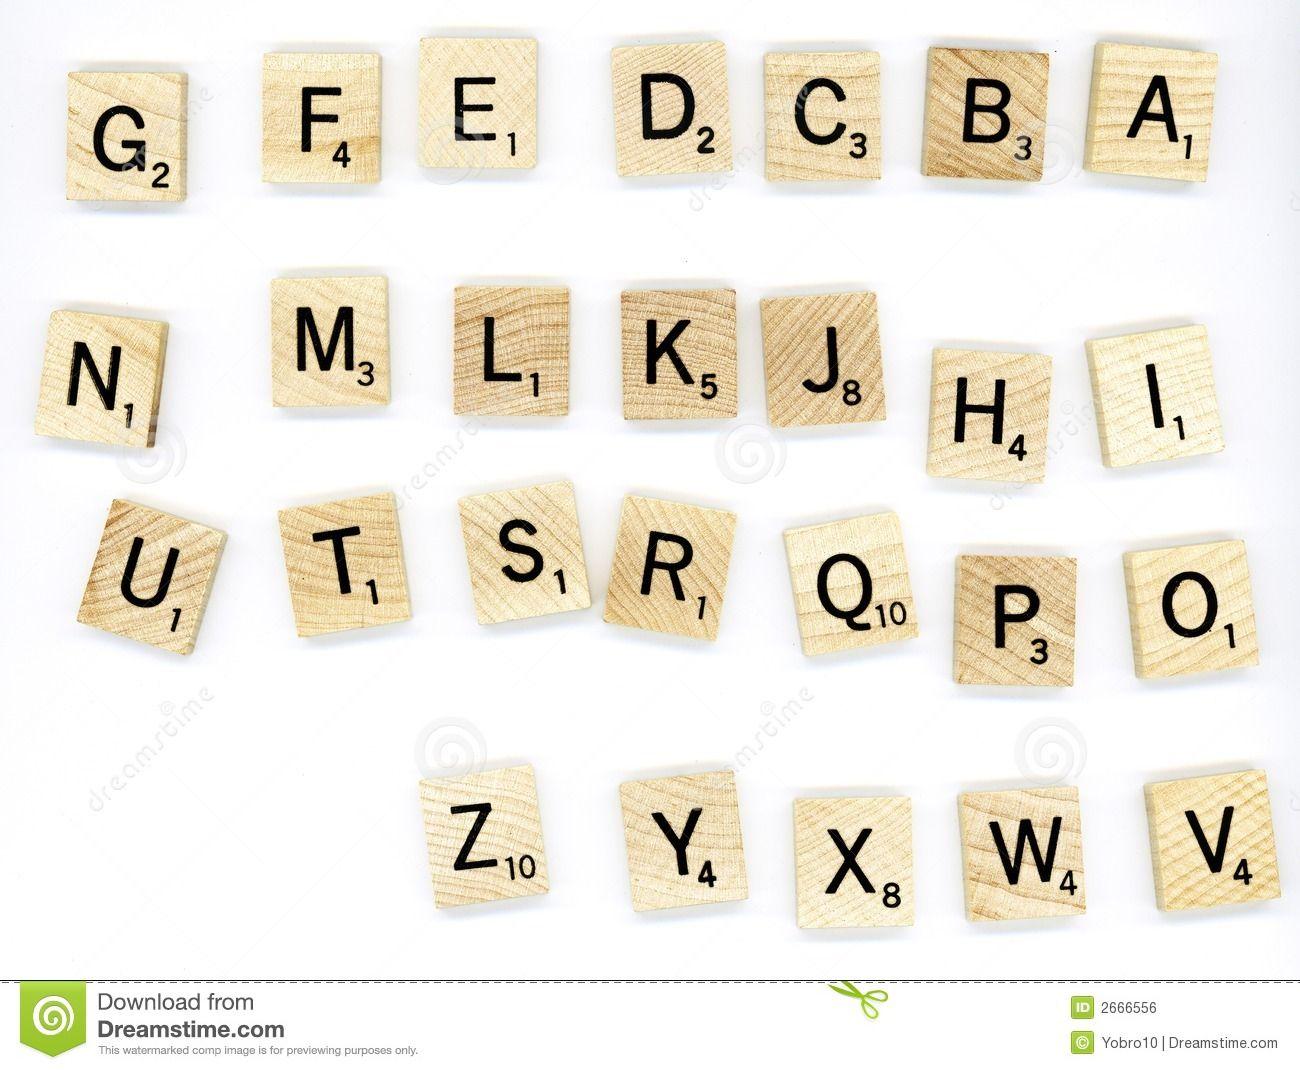 Scrabble Wood Letter Blocks Royalty Free Stock Image